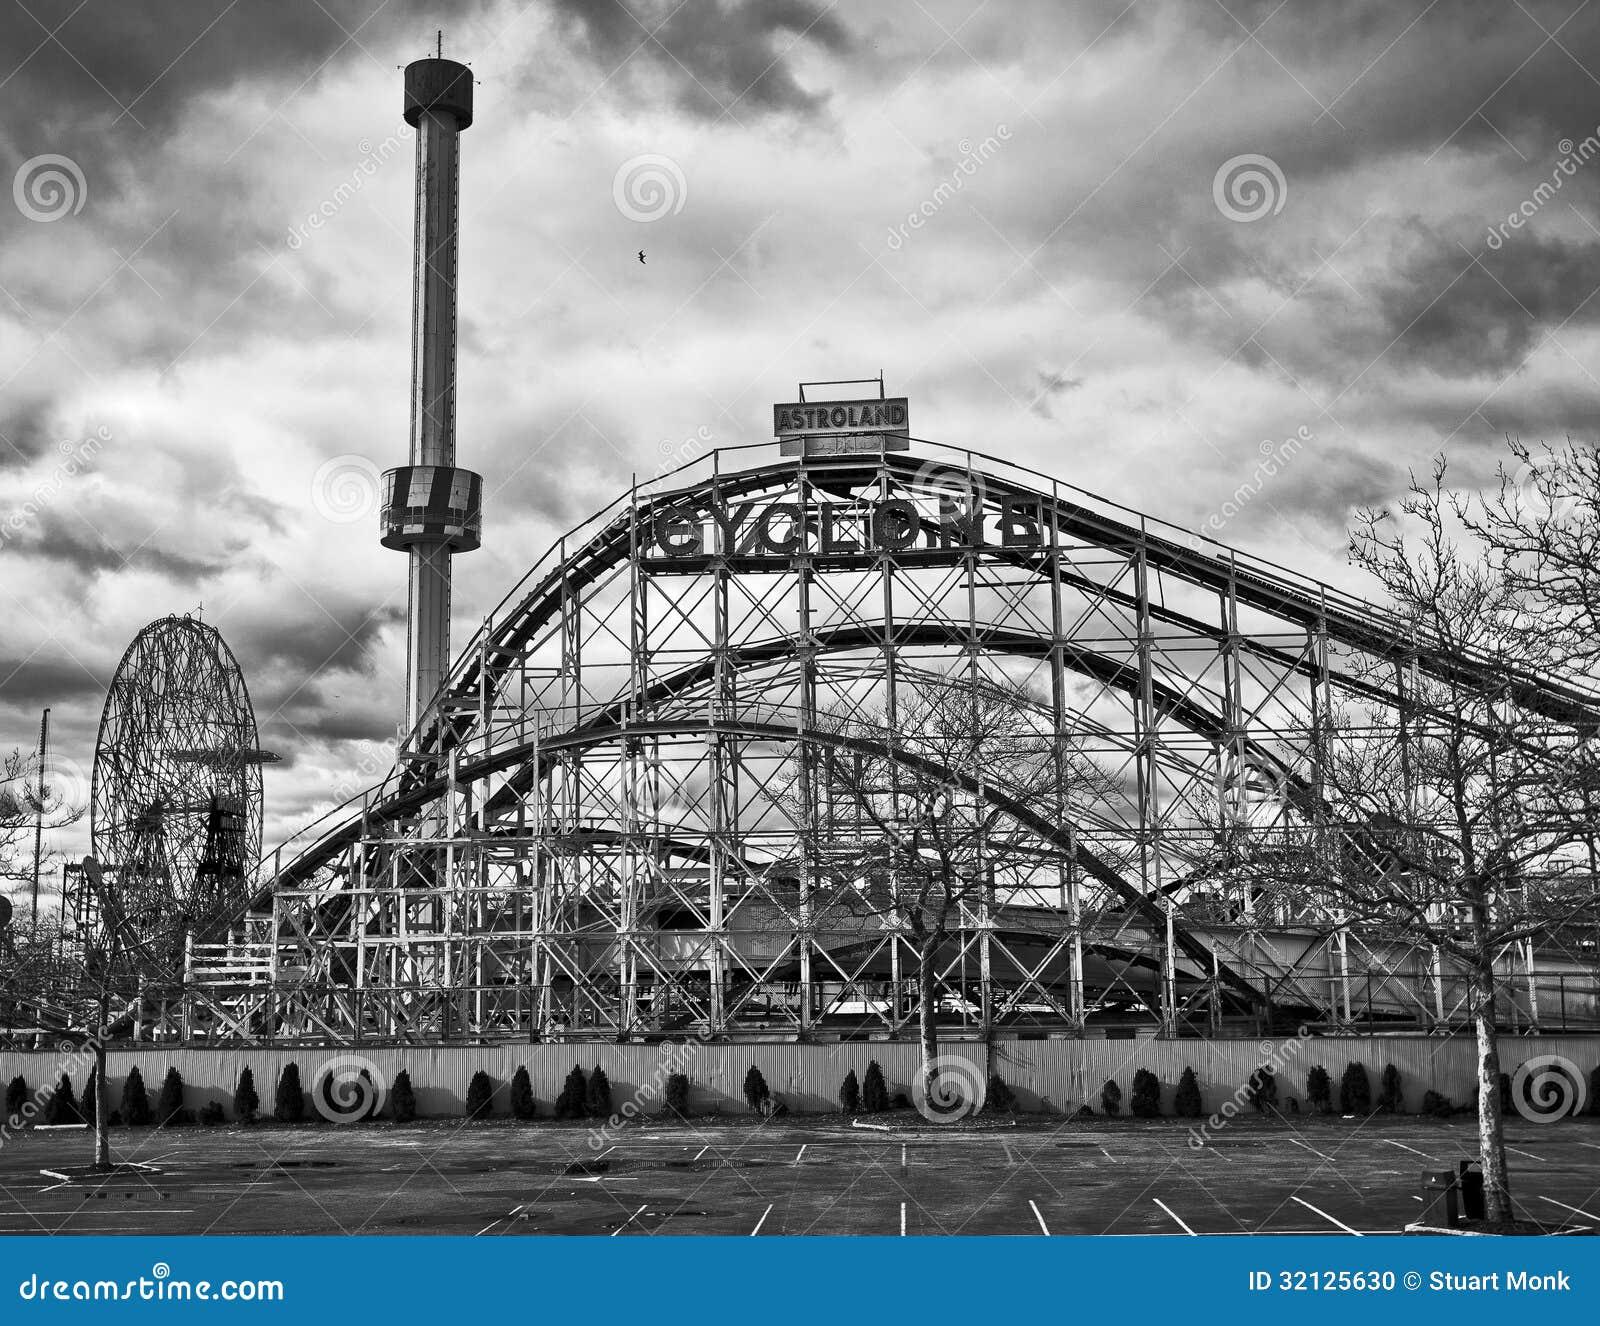 Physics of an amusement park ocean park essay